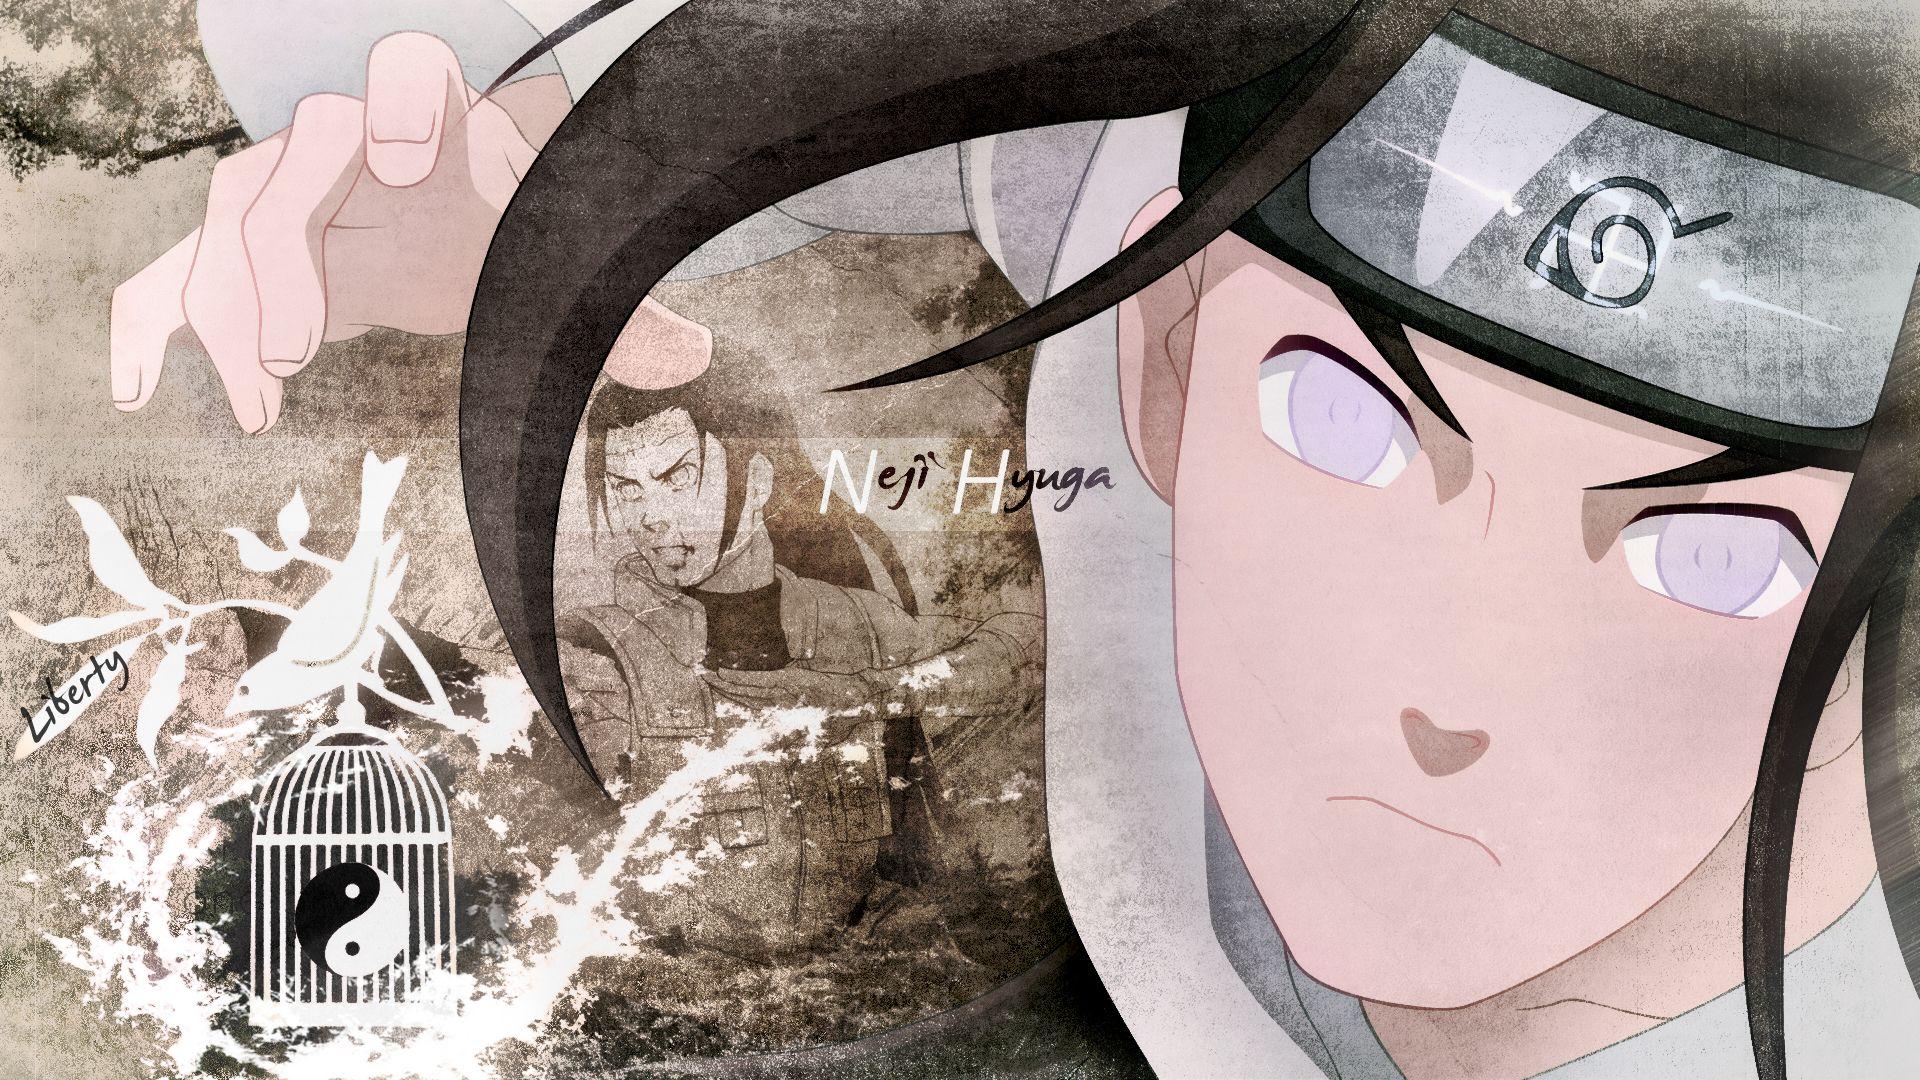 Fonds D Ecran Manga Naruto Neji Hyuga Liberty Anime Noir Et Blanc Images